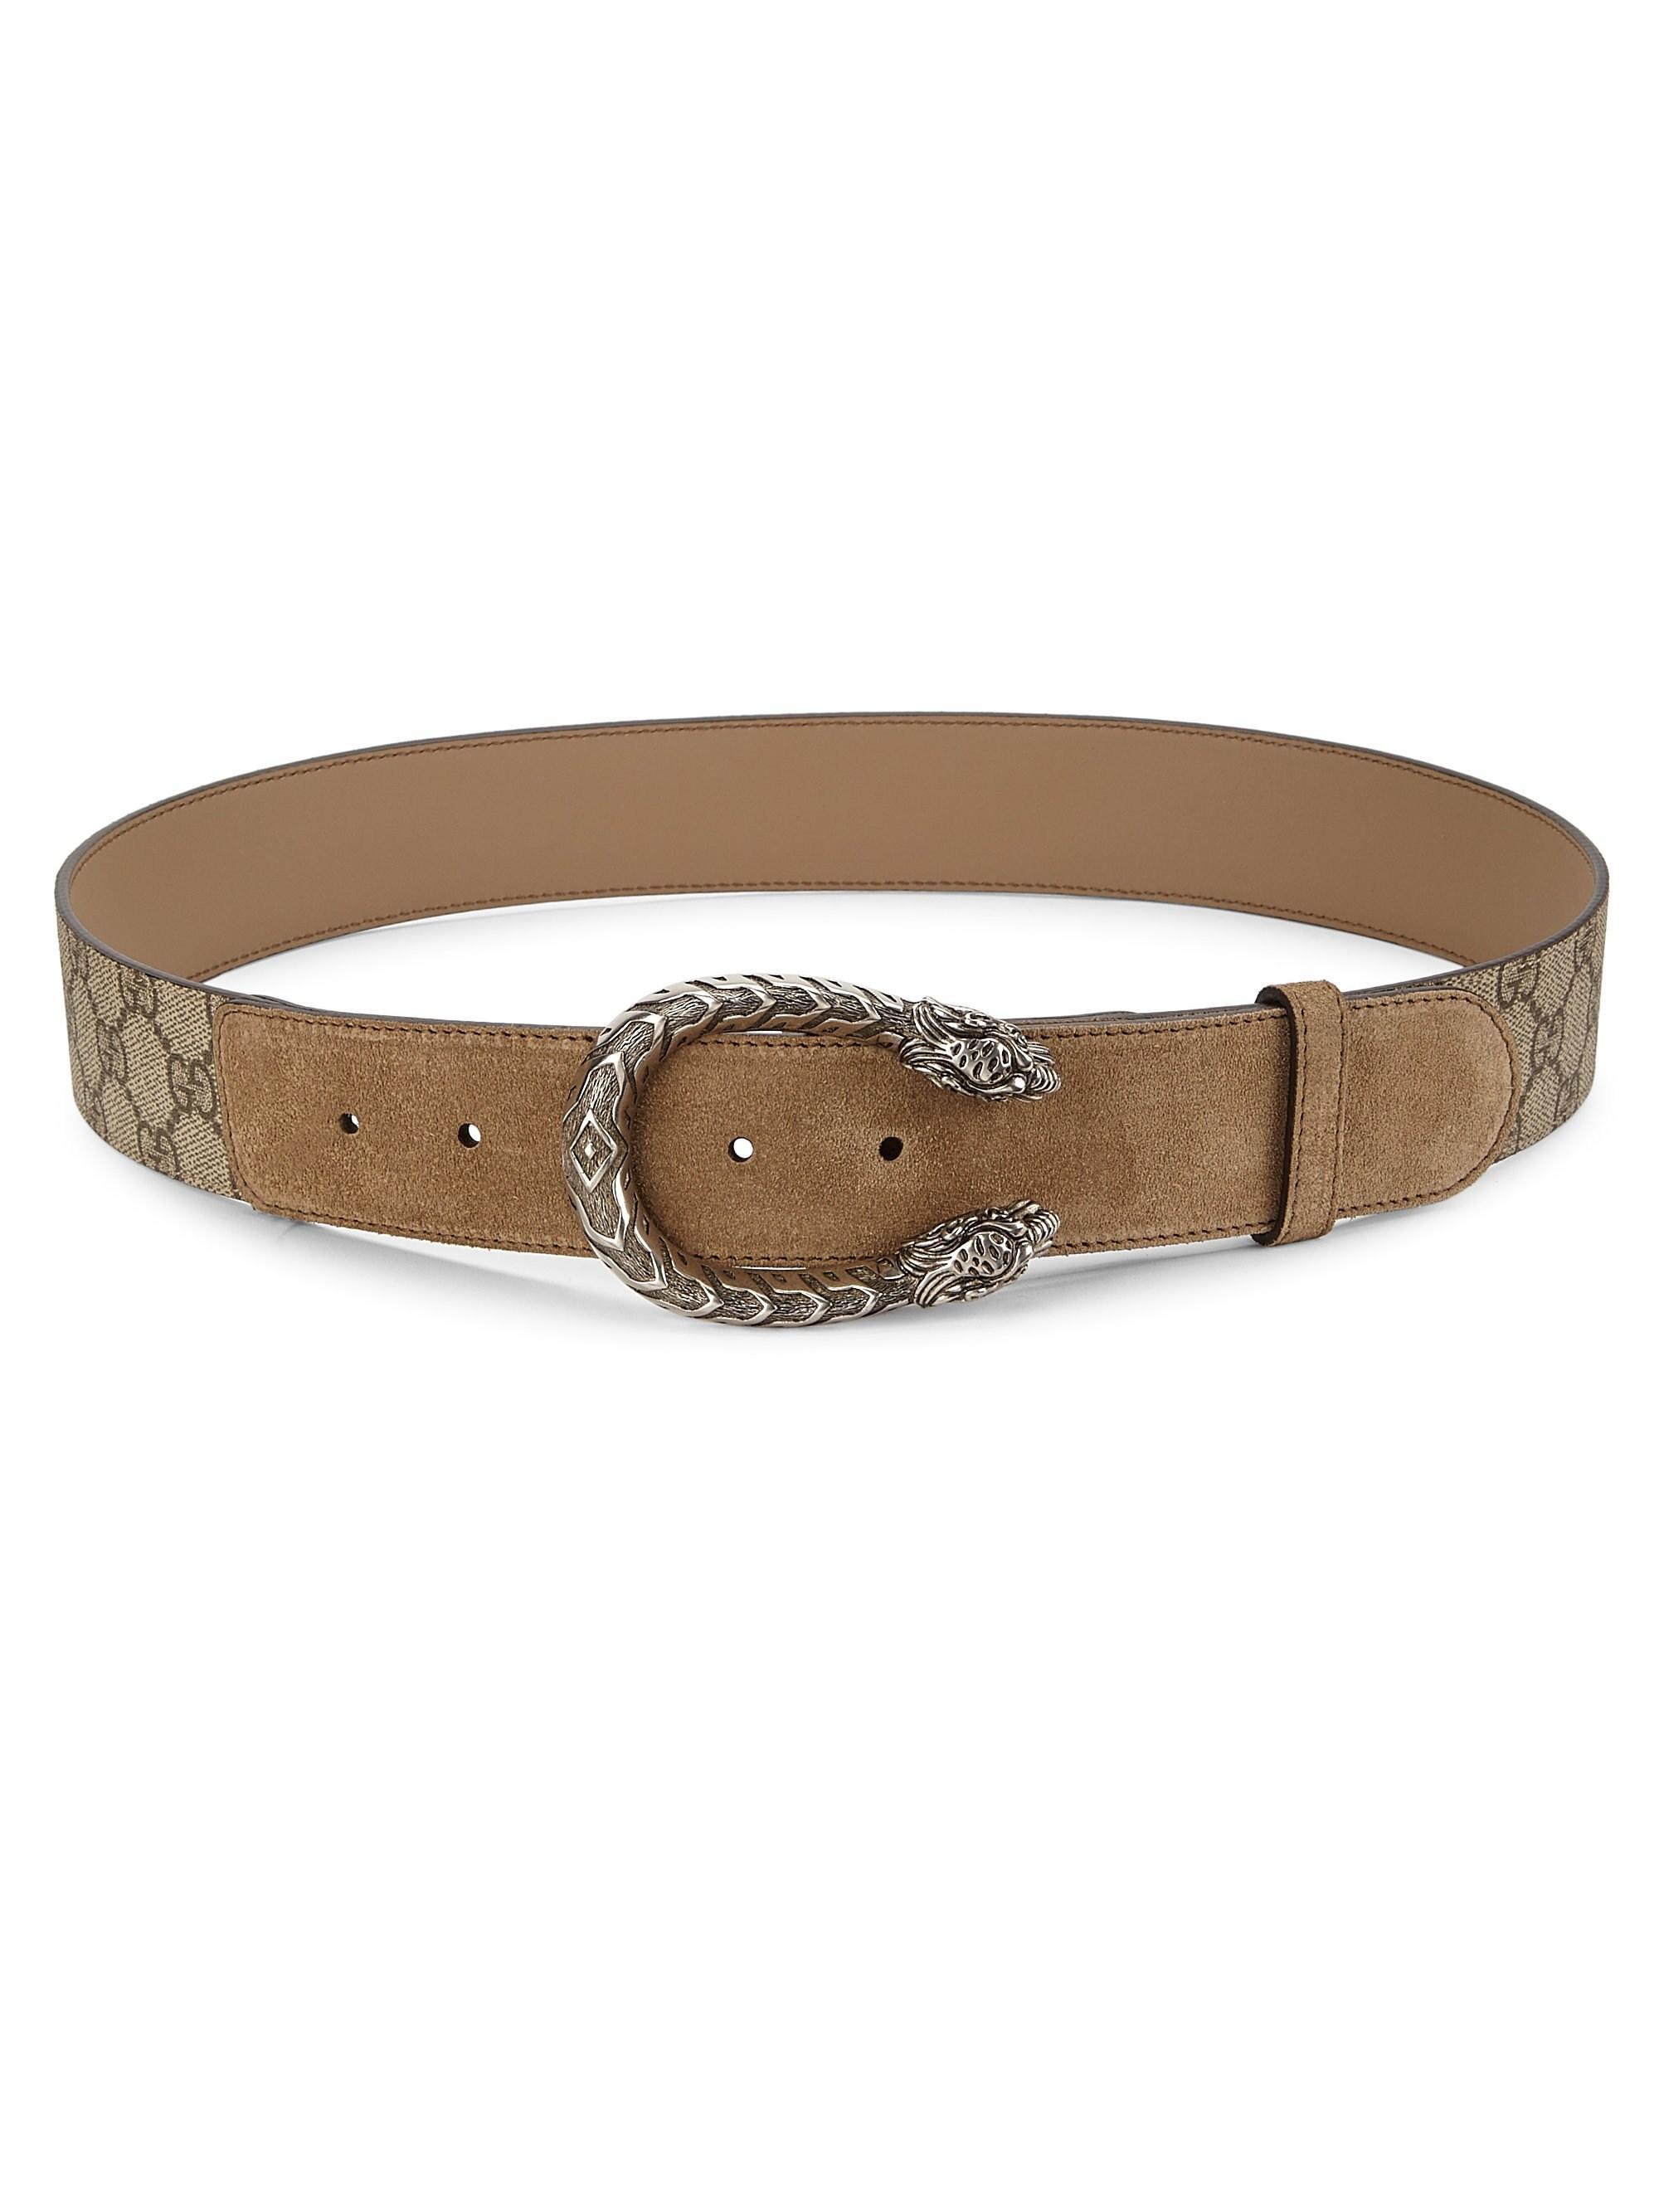 ff58032d8 Lyst - Gucci Women's Dionysus Suede Belt - Beige Multi